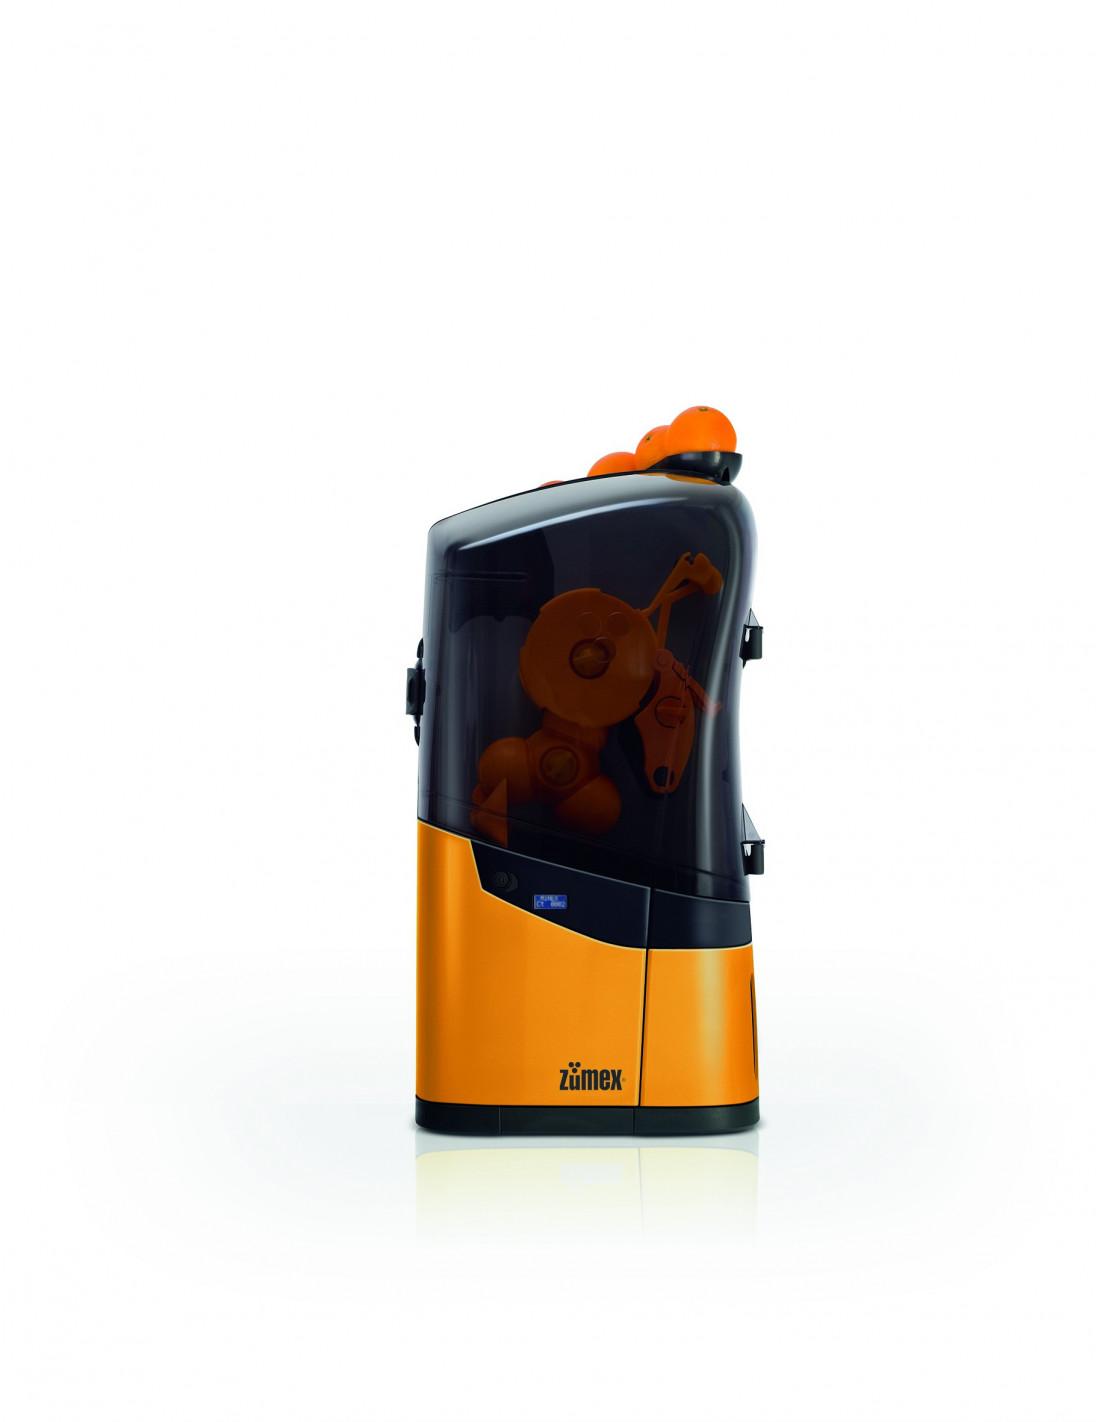 Zumex Minex Orange Citrus Juicer Juicers